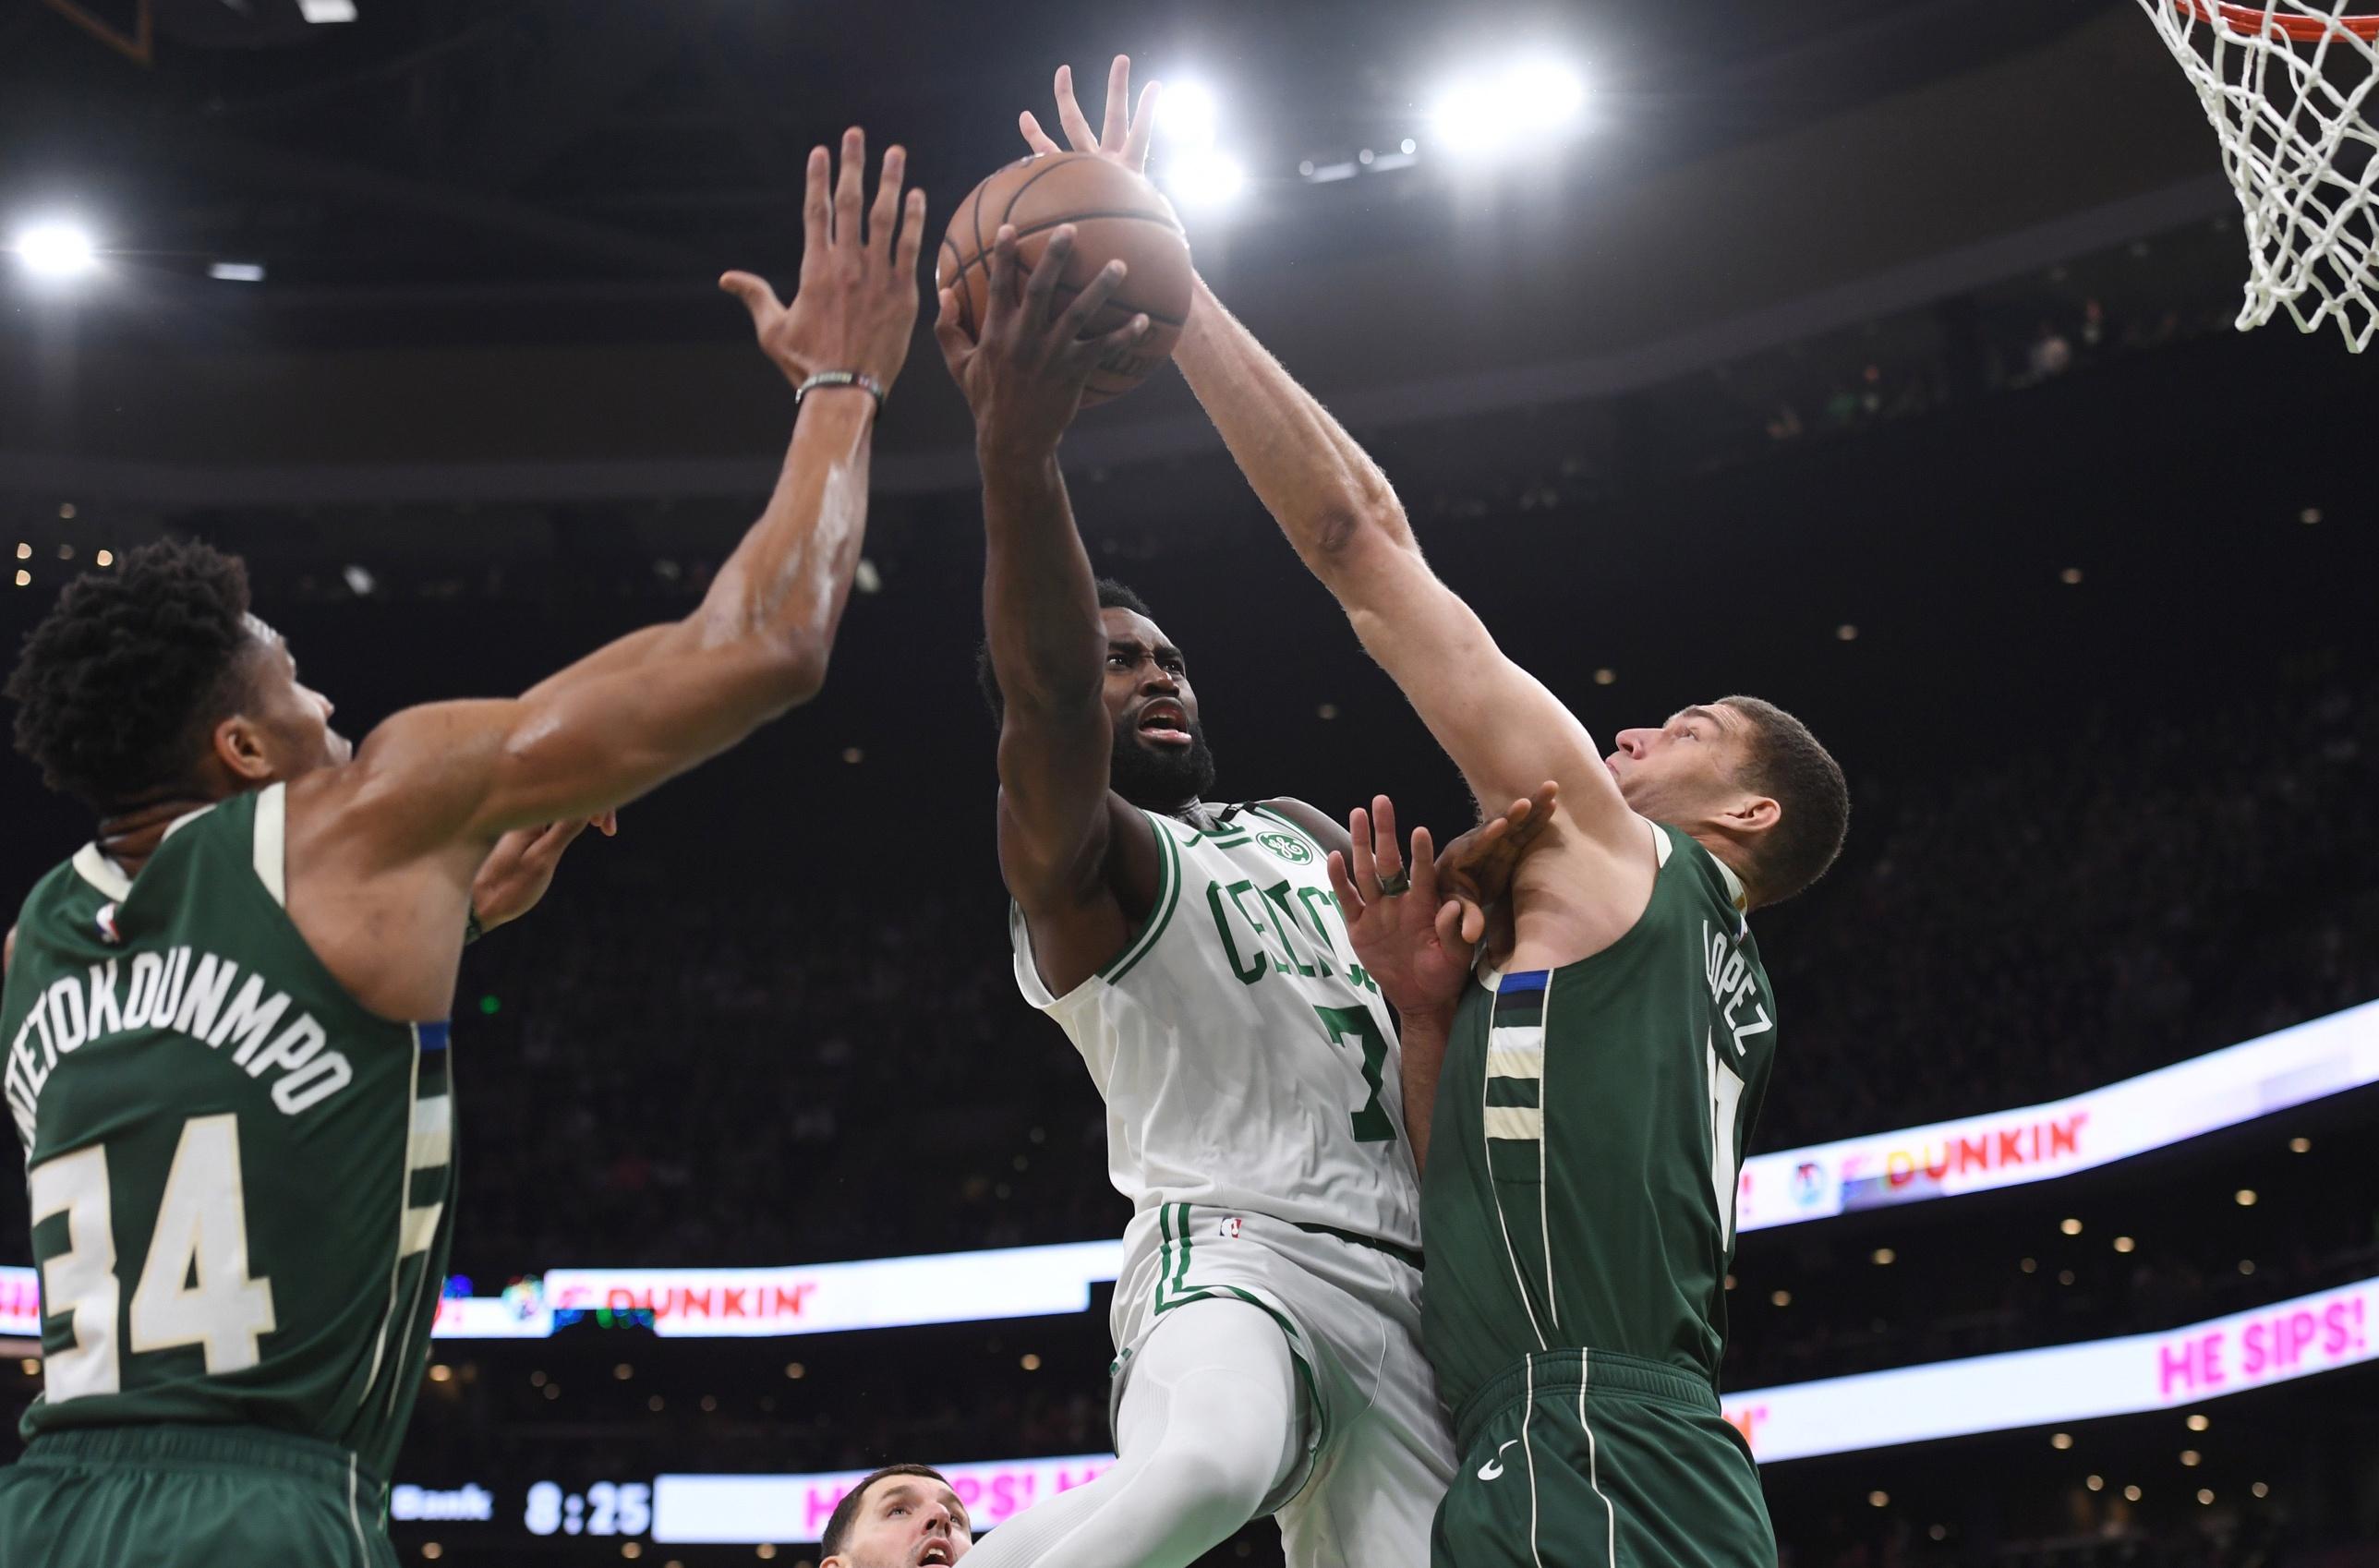 Recap: Bucks survive Boston's hot start and take 2-1 series lead